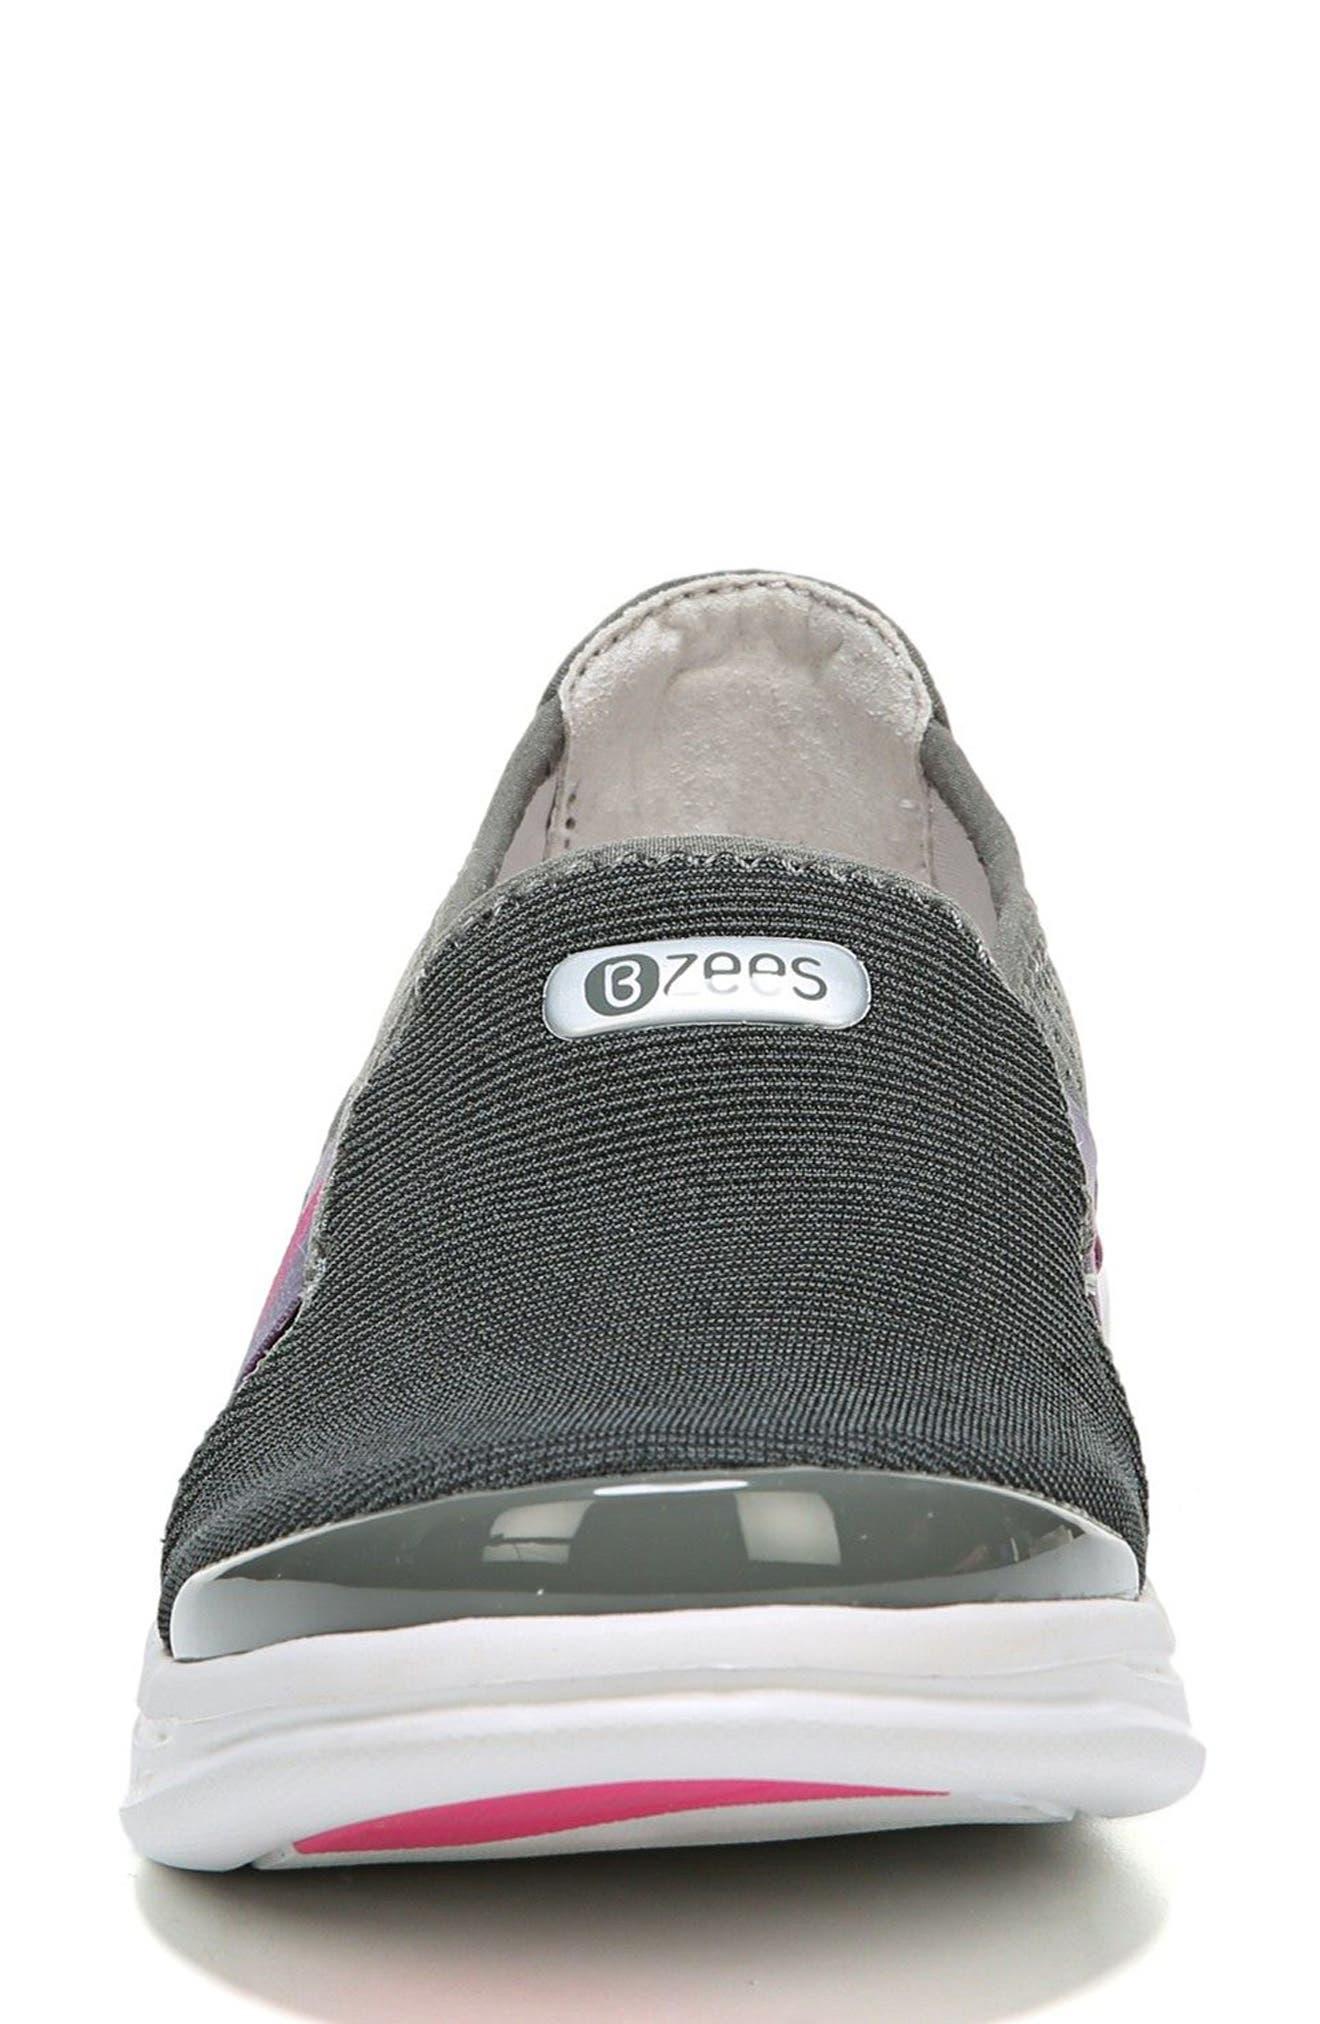 Cruise Slip-On Sneaker,                             Alternate thumbnail 4, color,                             DARK GREY FABRIC